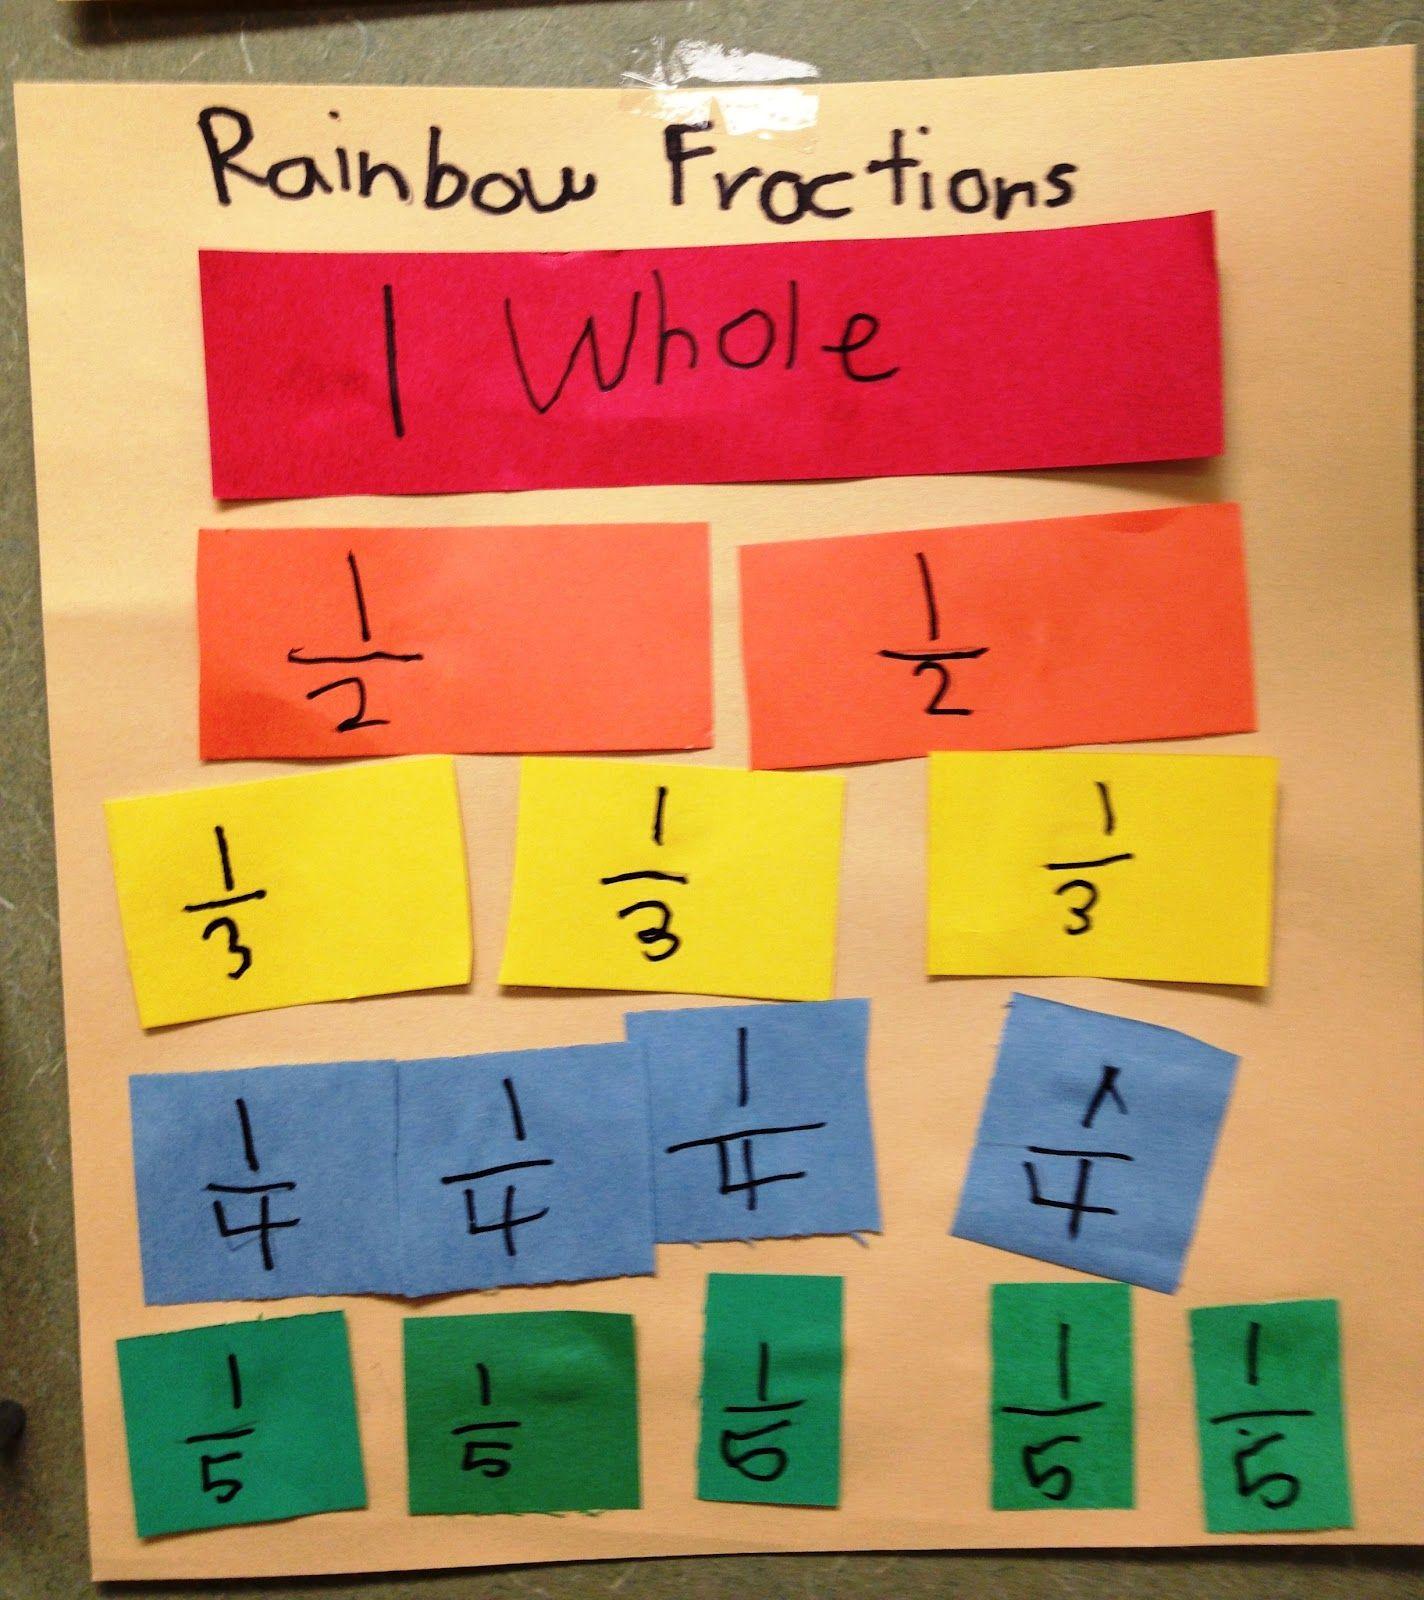 Rainbow fractions